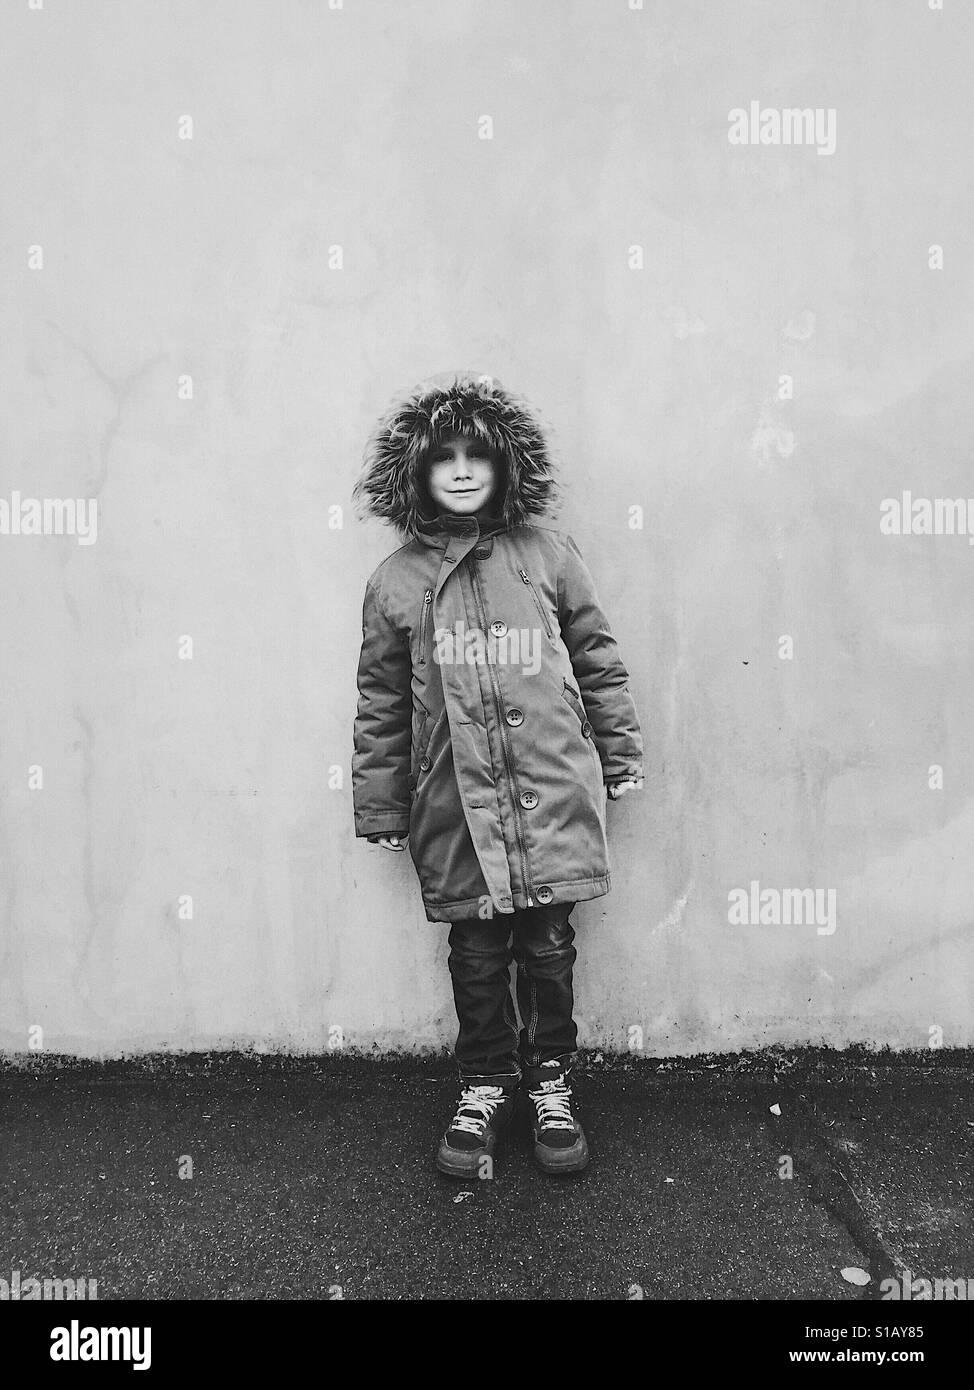 Young Boy entlang der Wand Stockfoto